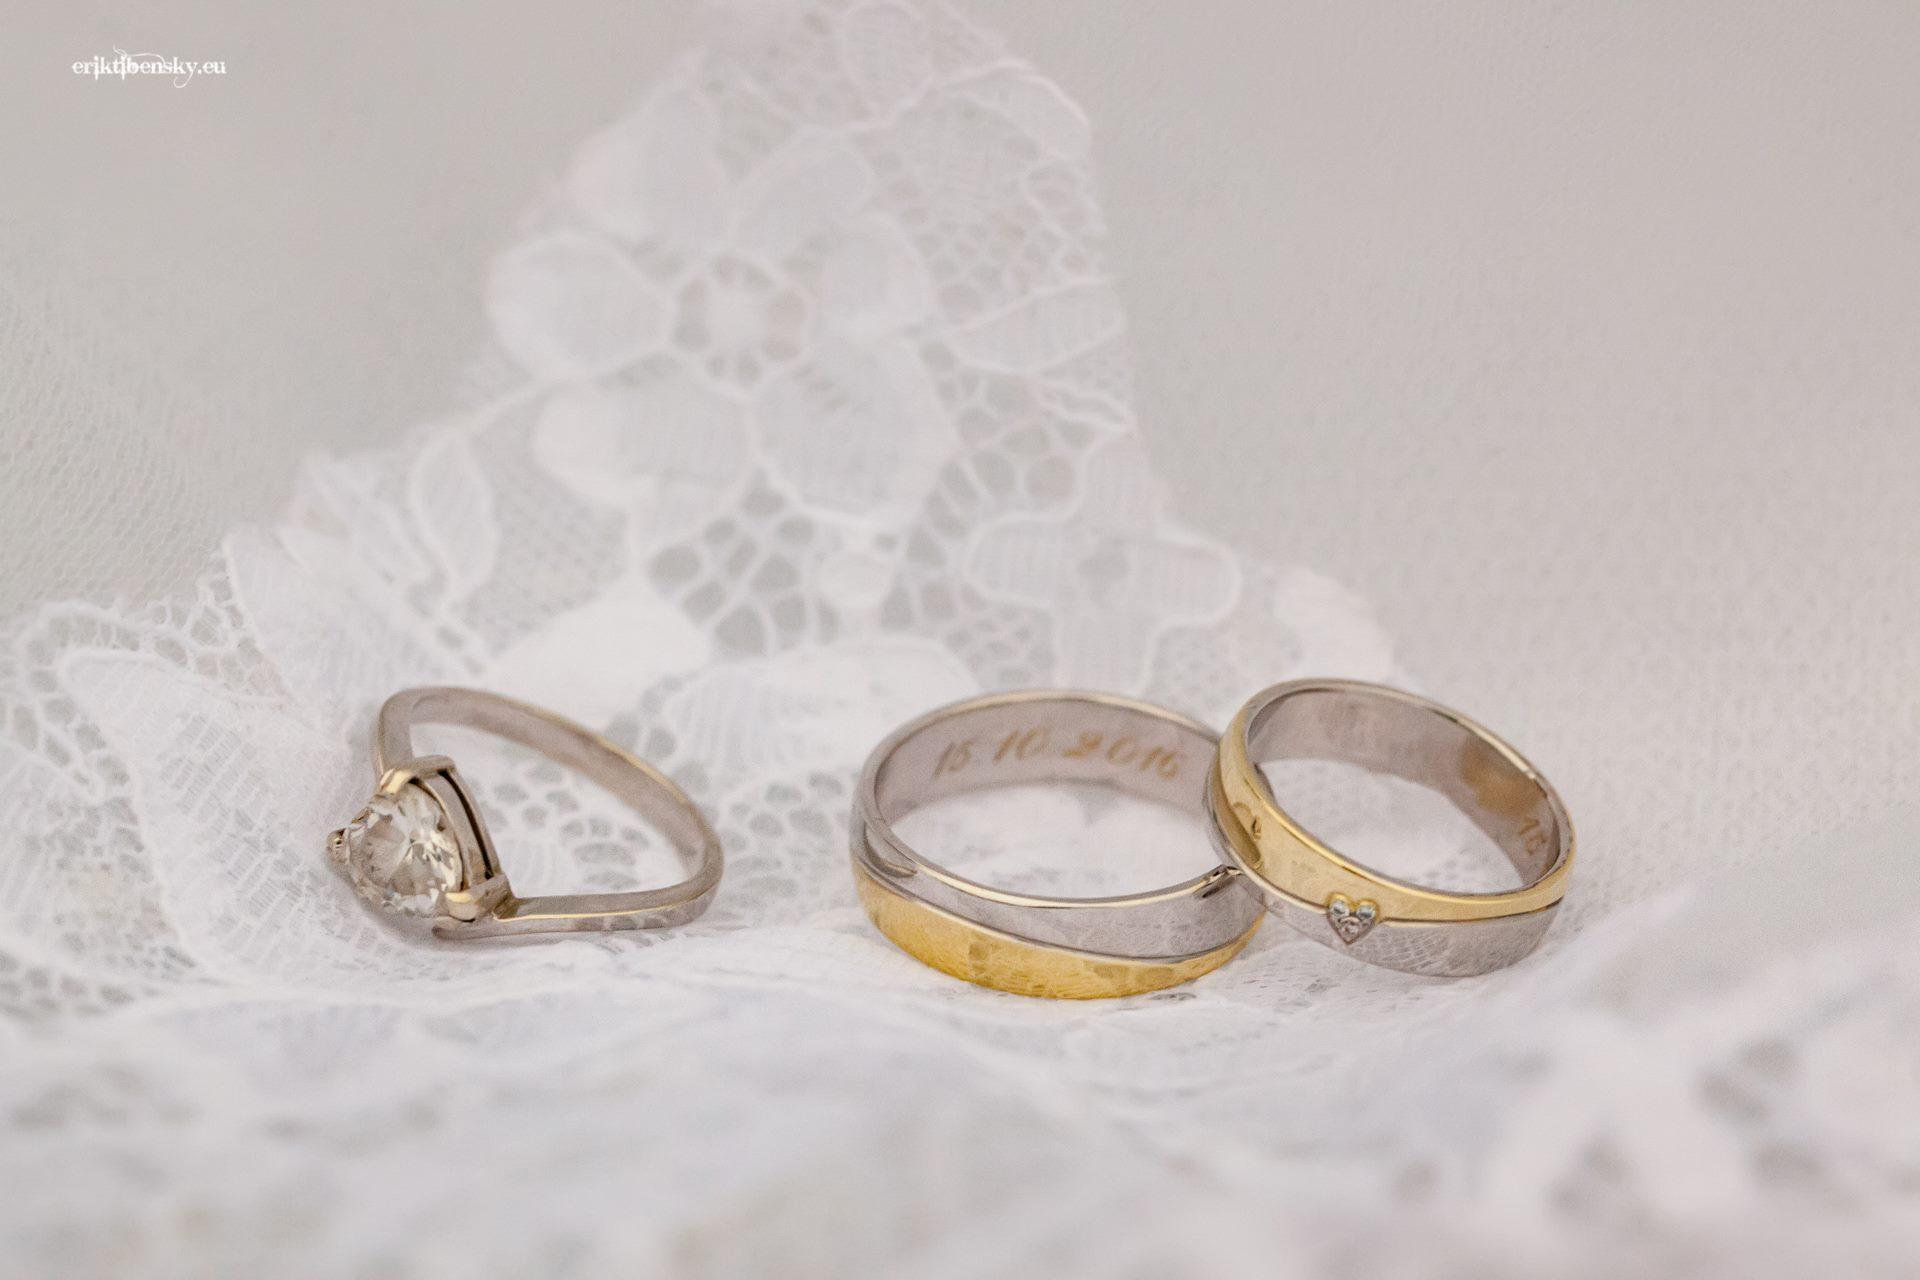 eriktibensky-eu-fotograf-wedding-photo-svadba-svadobny-pezinok-bratislava-modra-senec-1005